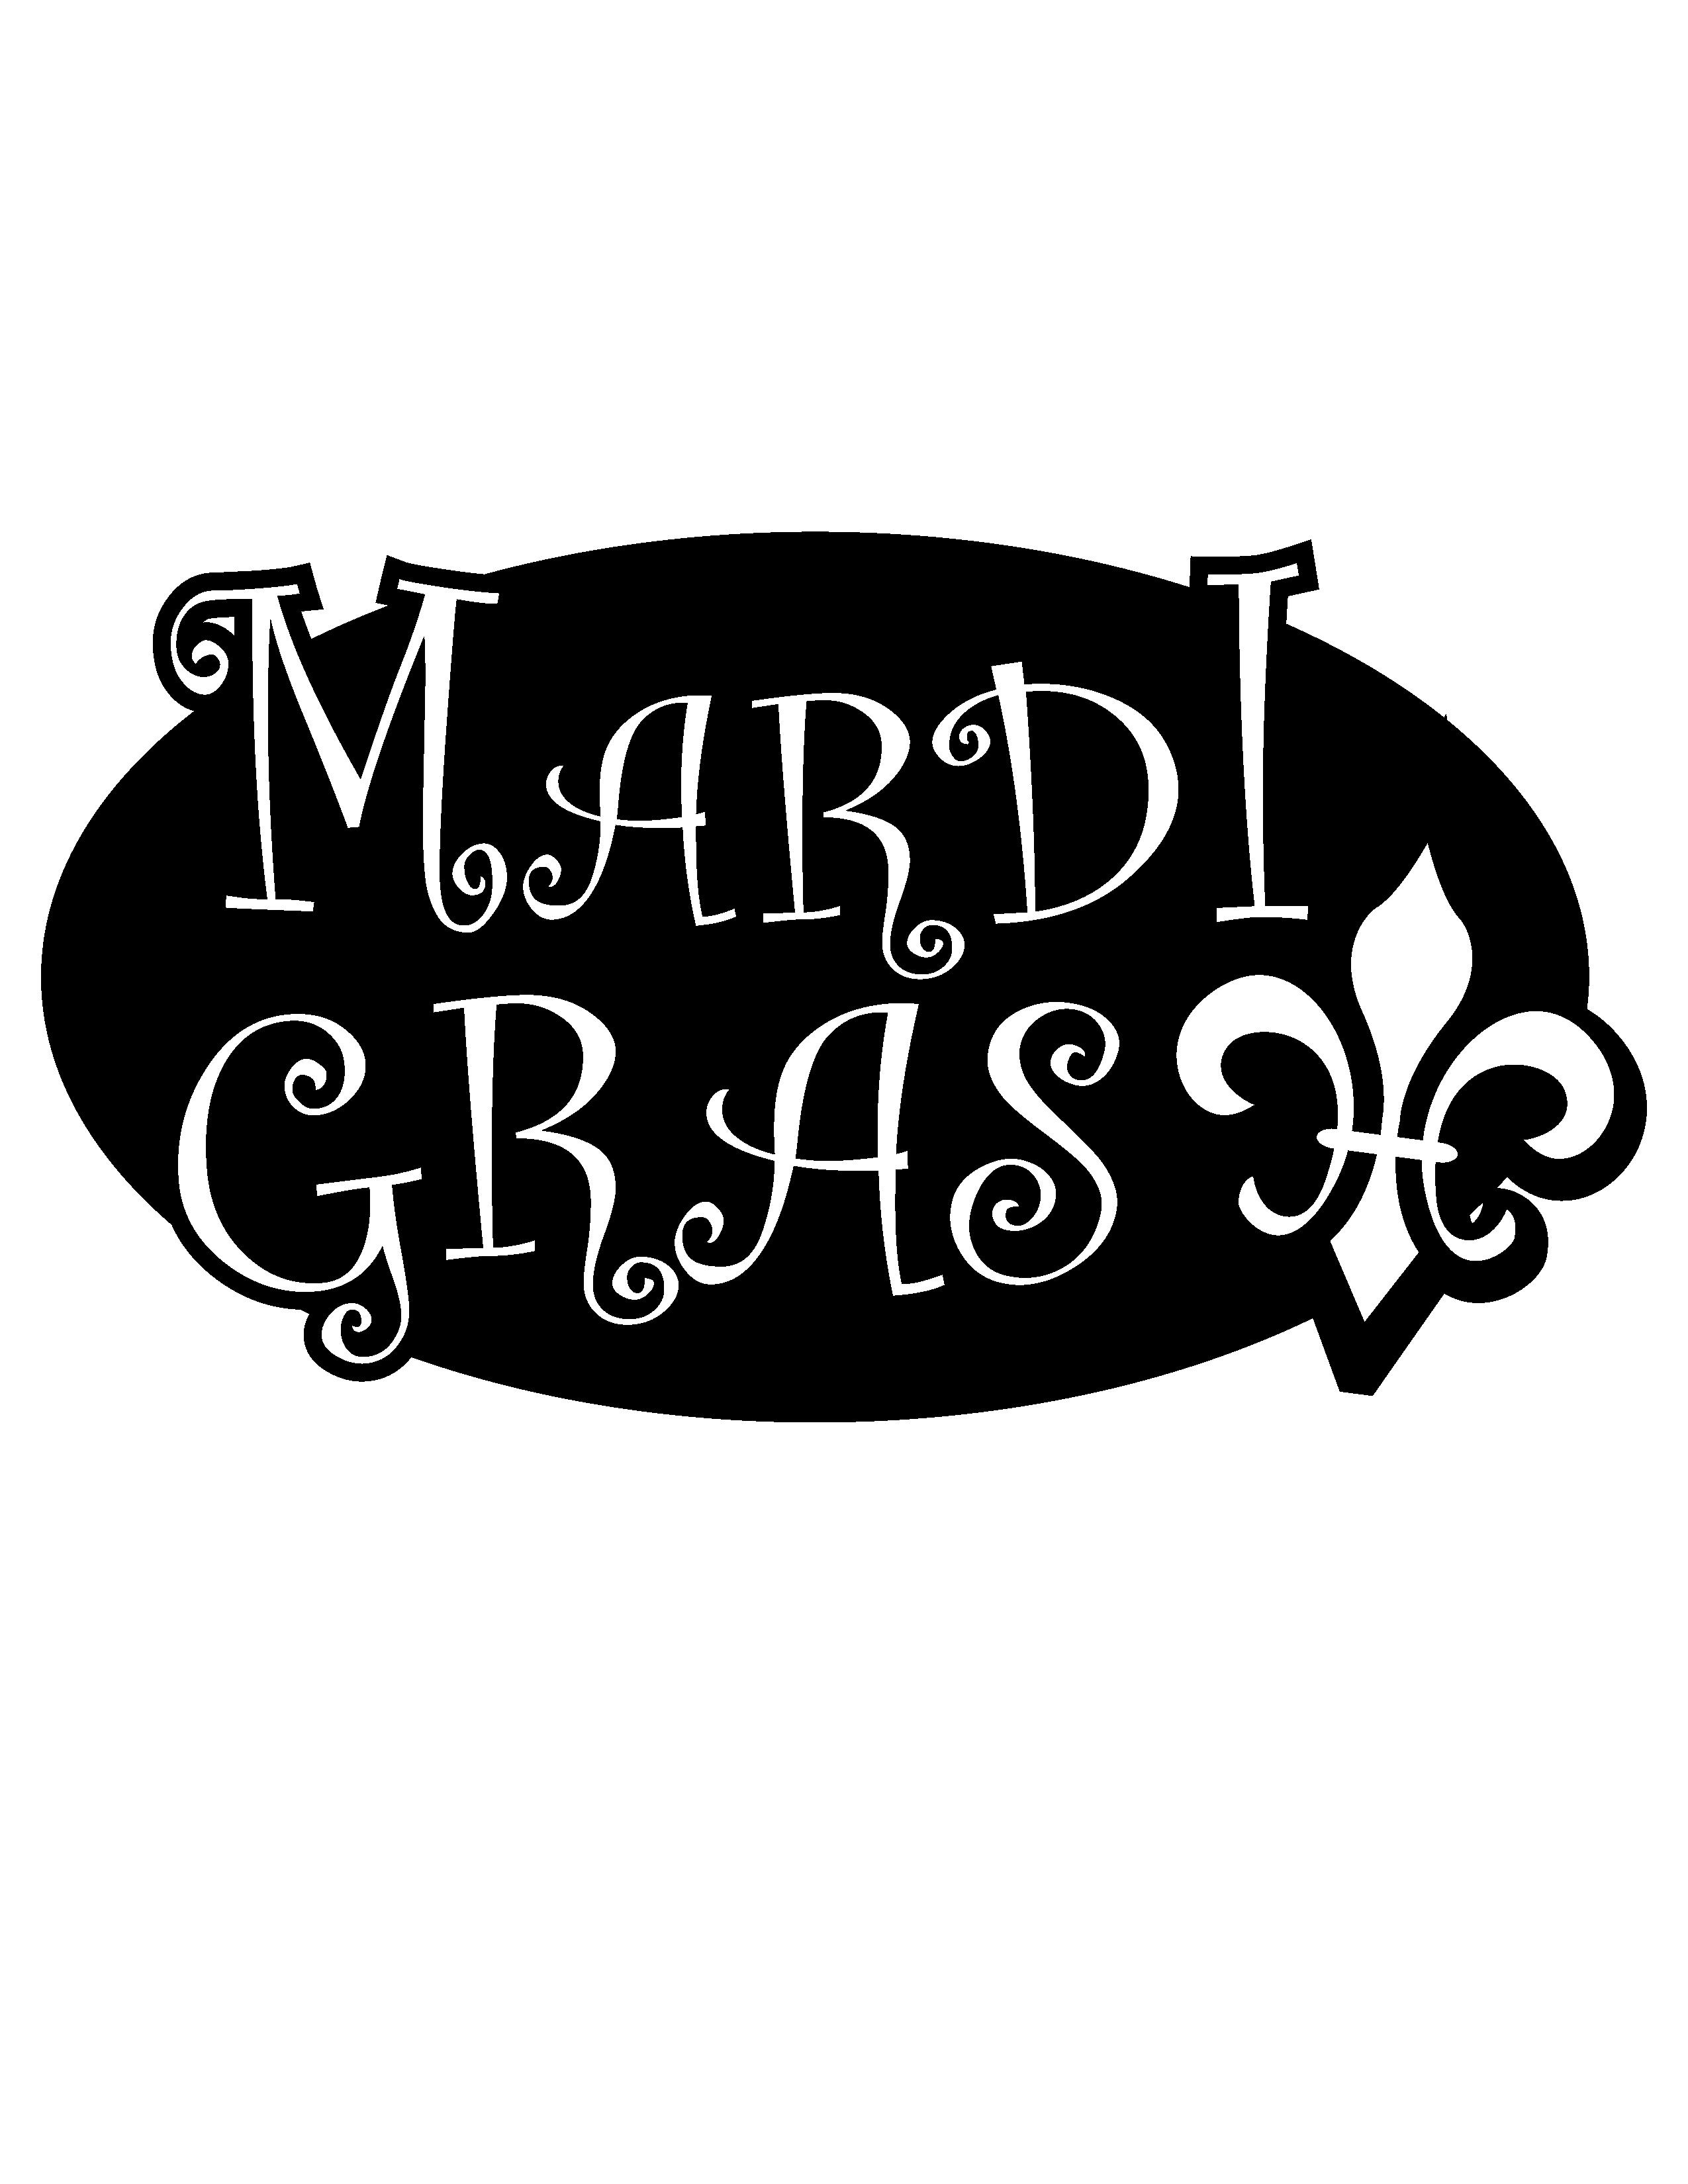 Mardi Gras Black and White Outline Clip Art.